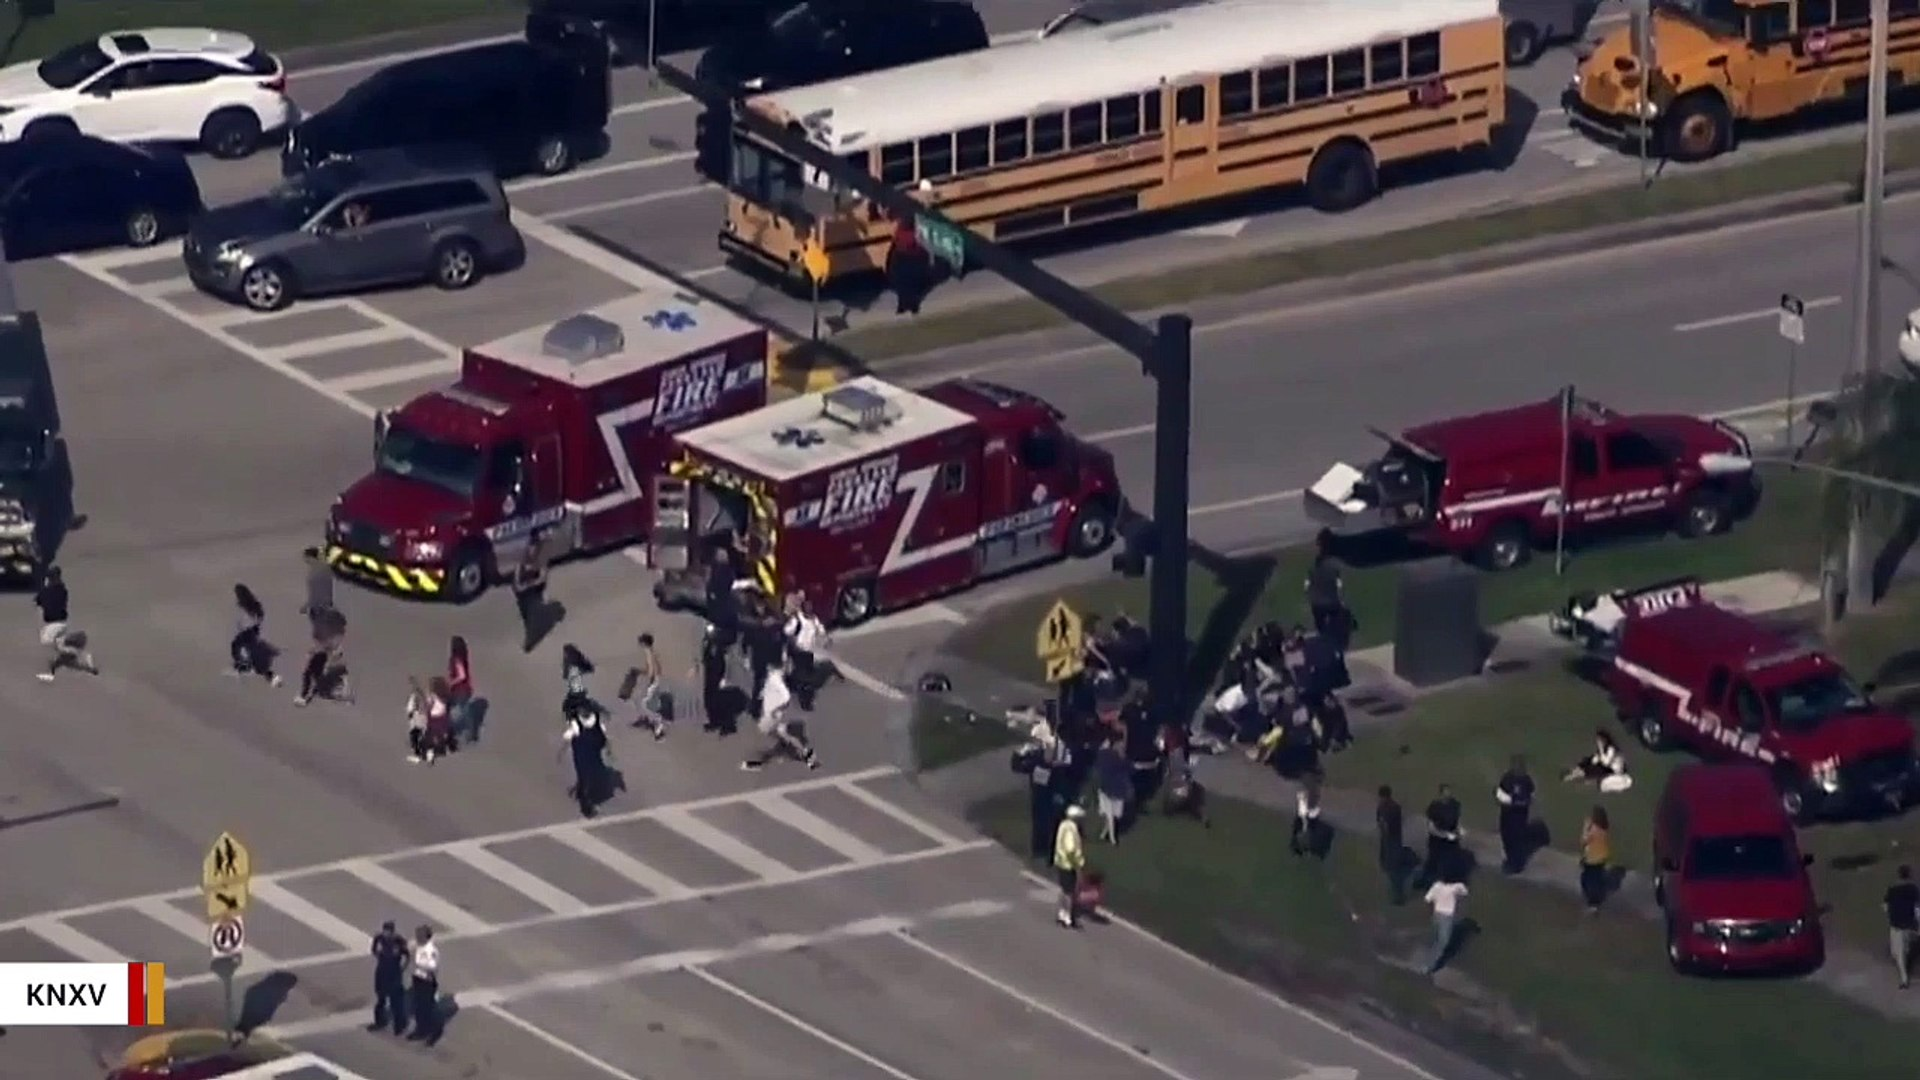 President Trump, Melania Trump Tweet About Florida Shooting